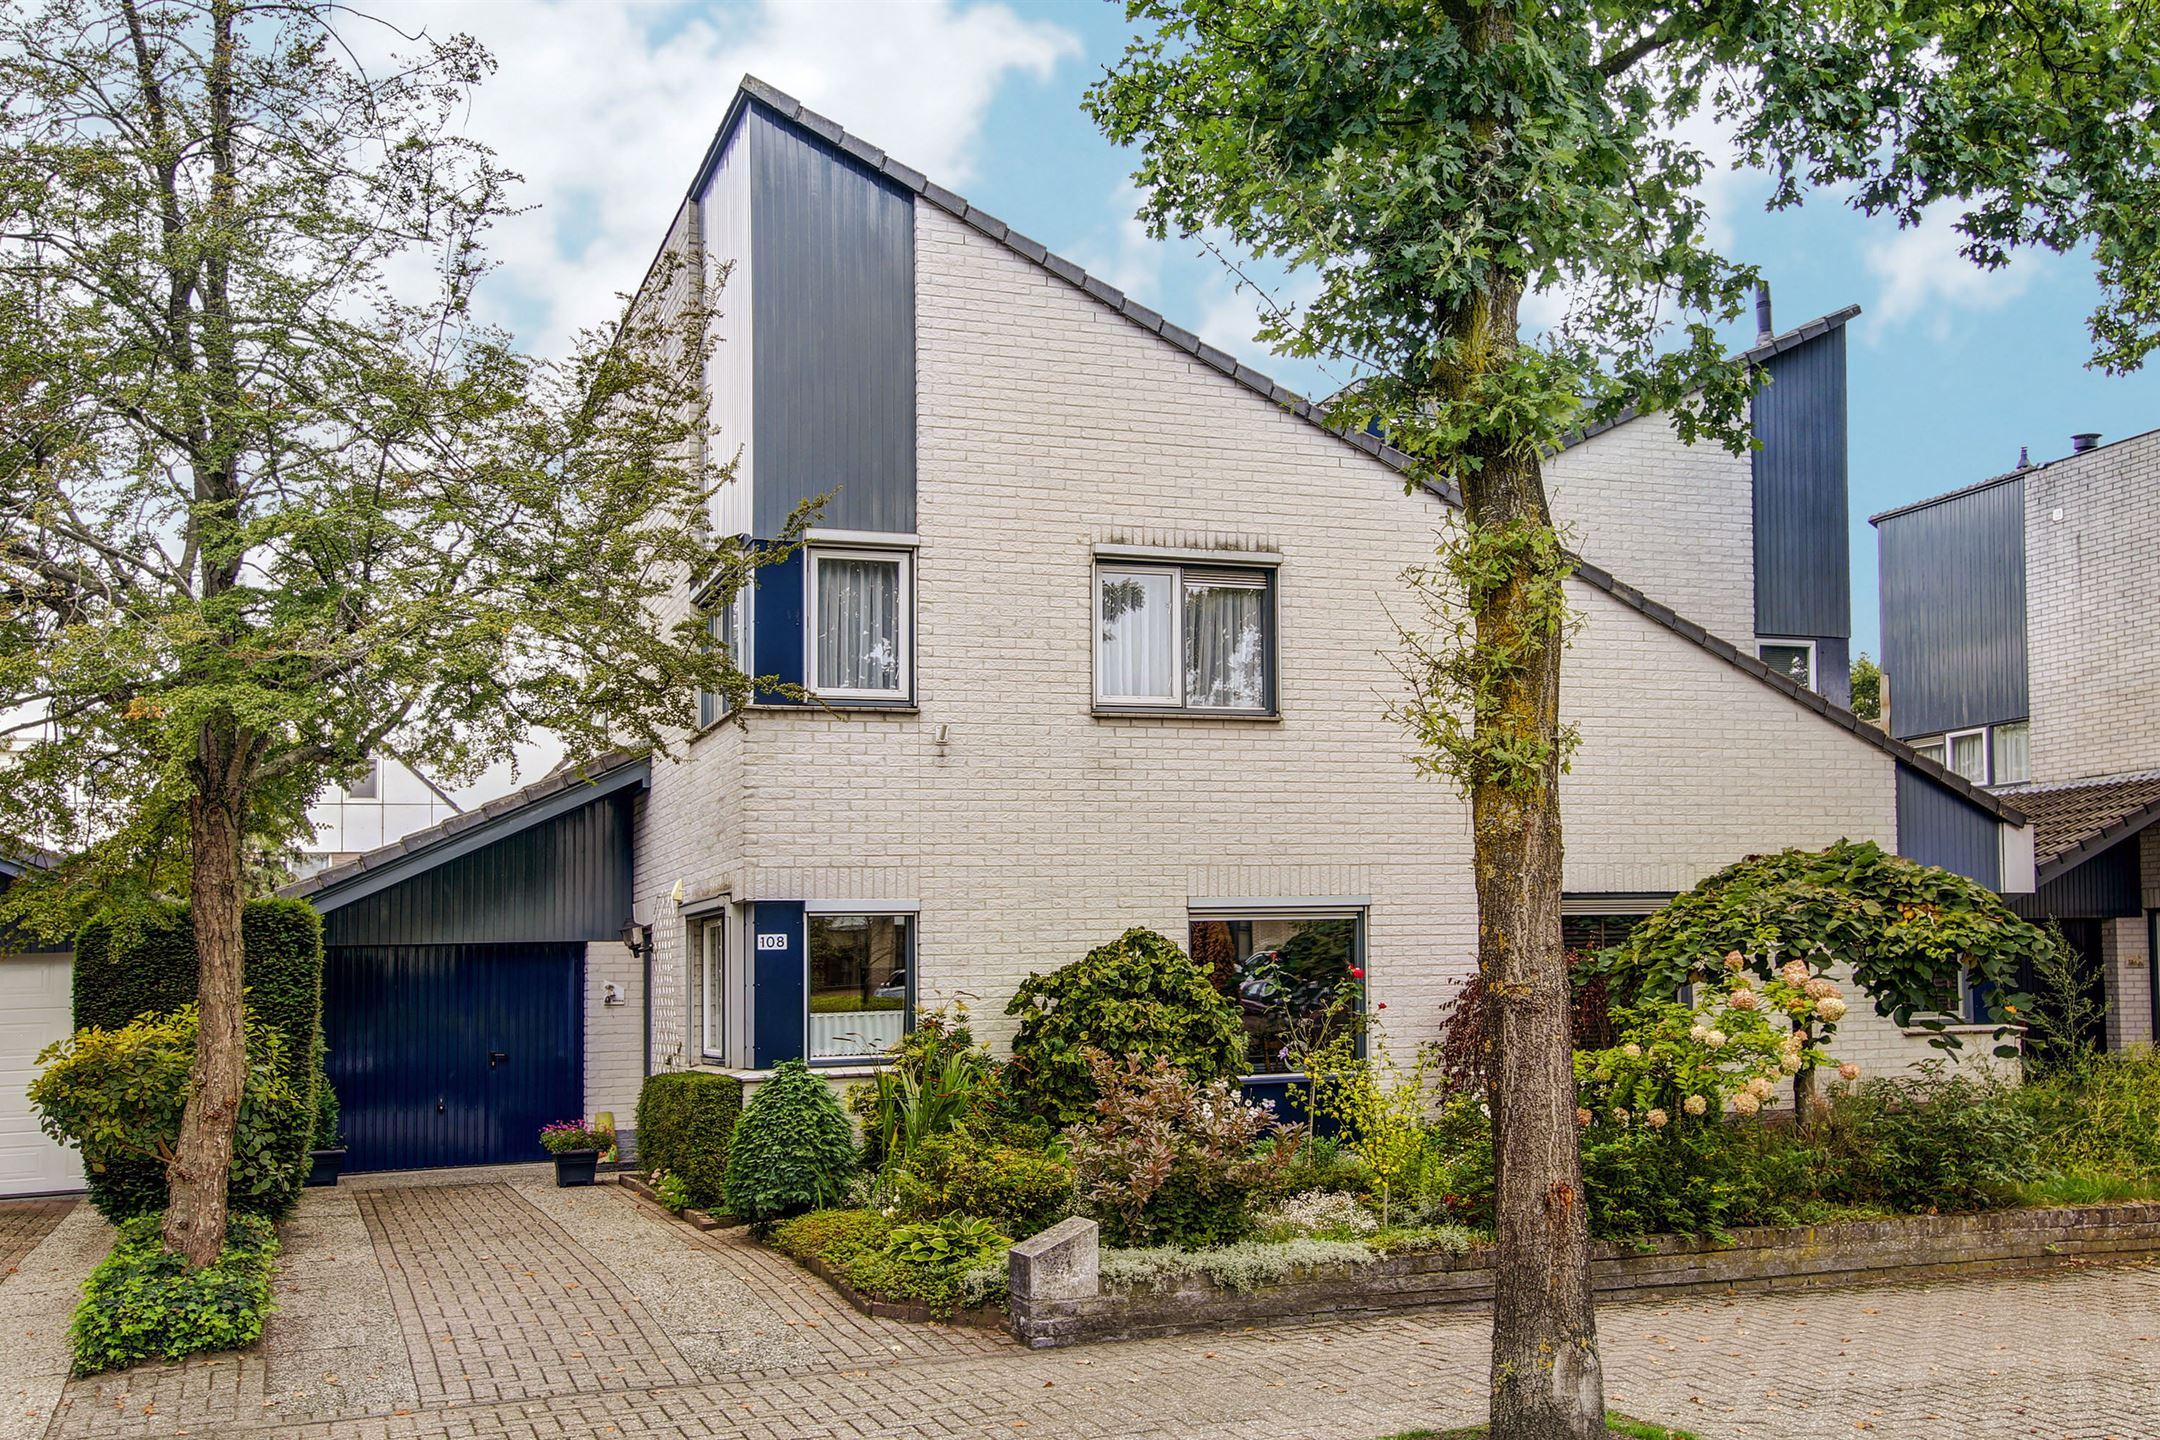 Huis te koop: bovenbuurtweg 108 6717 xc ede [funda]